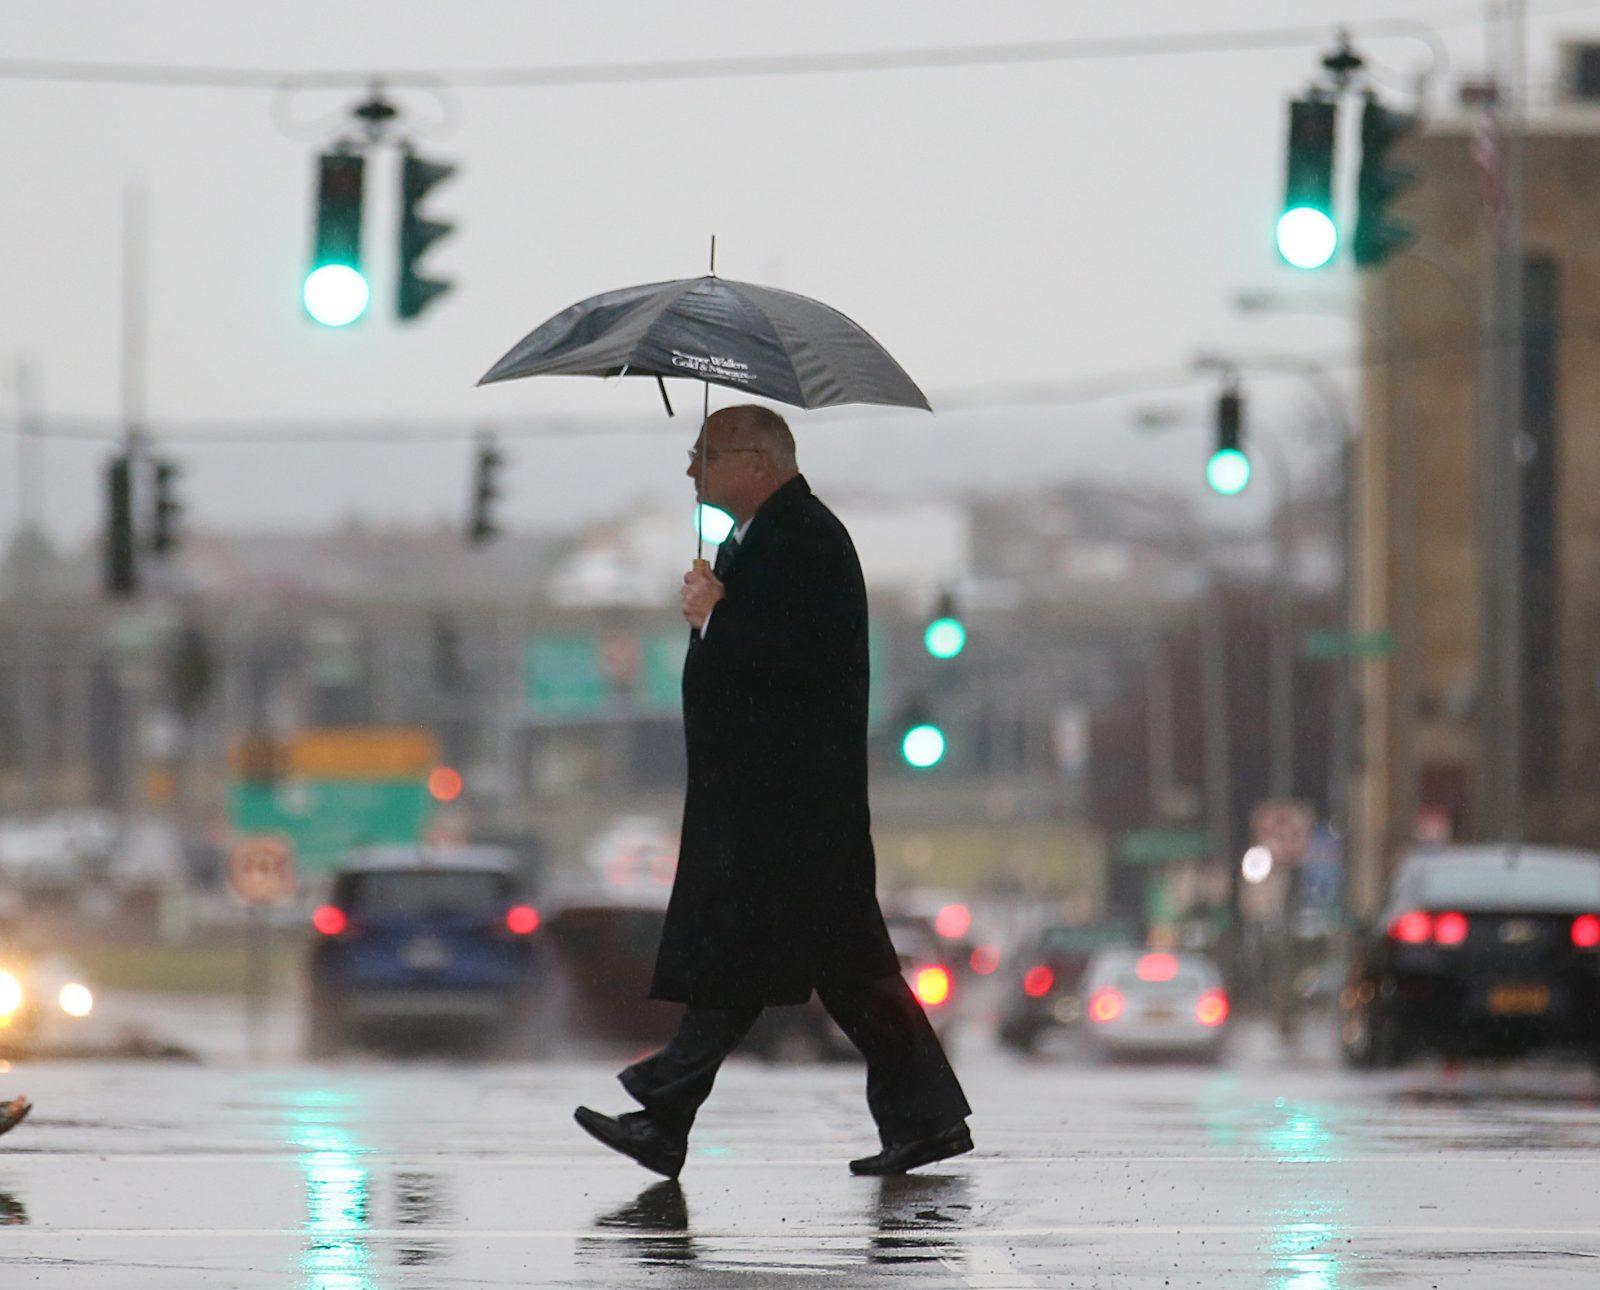 A pedestrian crosses North Division Street at Main Street in Buffalo on a rainy afternoon, Tuesday, Jan. 3, 2017. (Sharon Cantillon/Buffalo News)